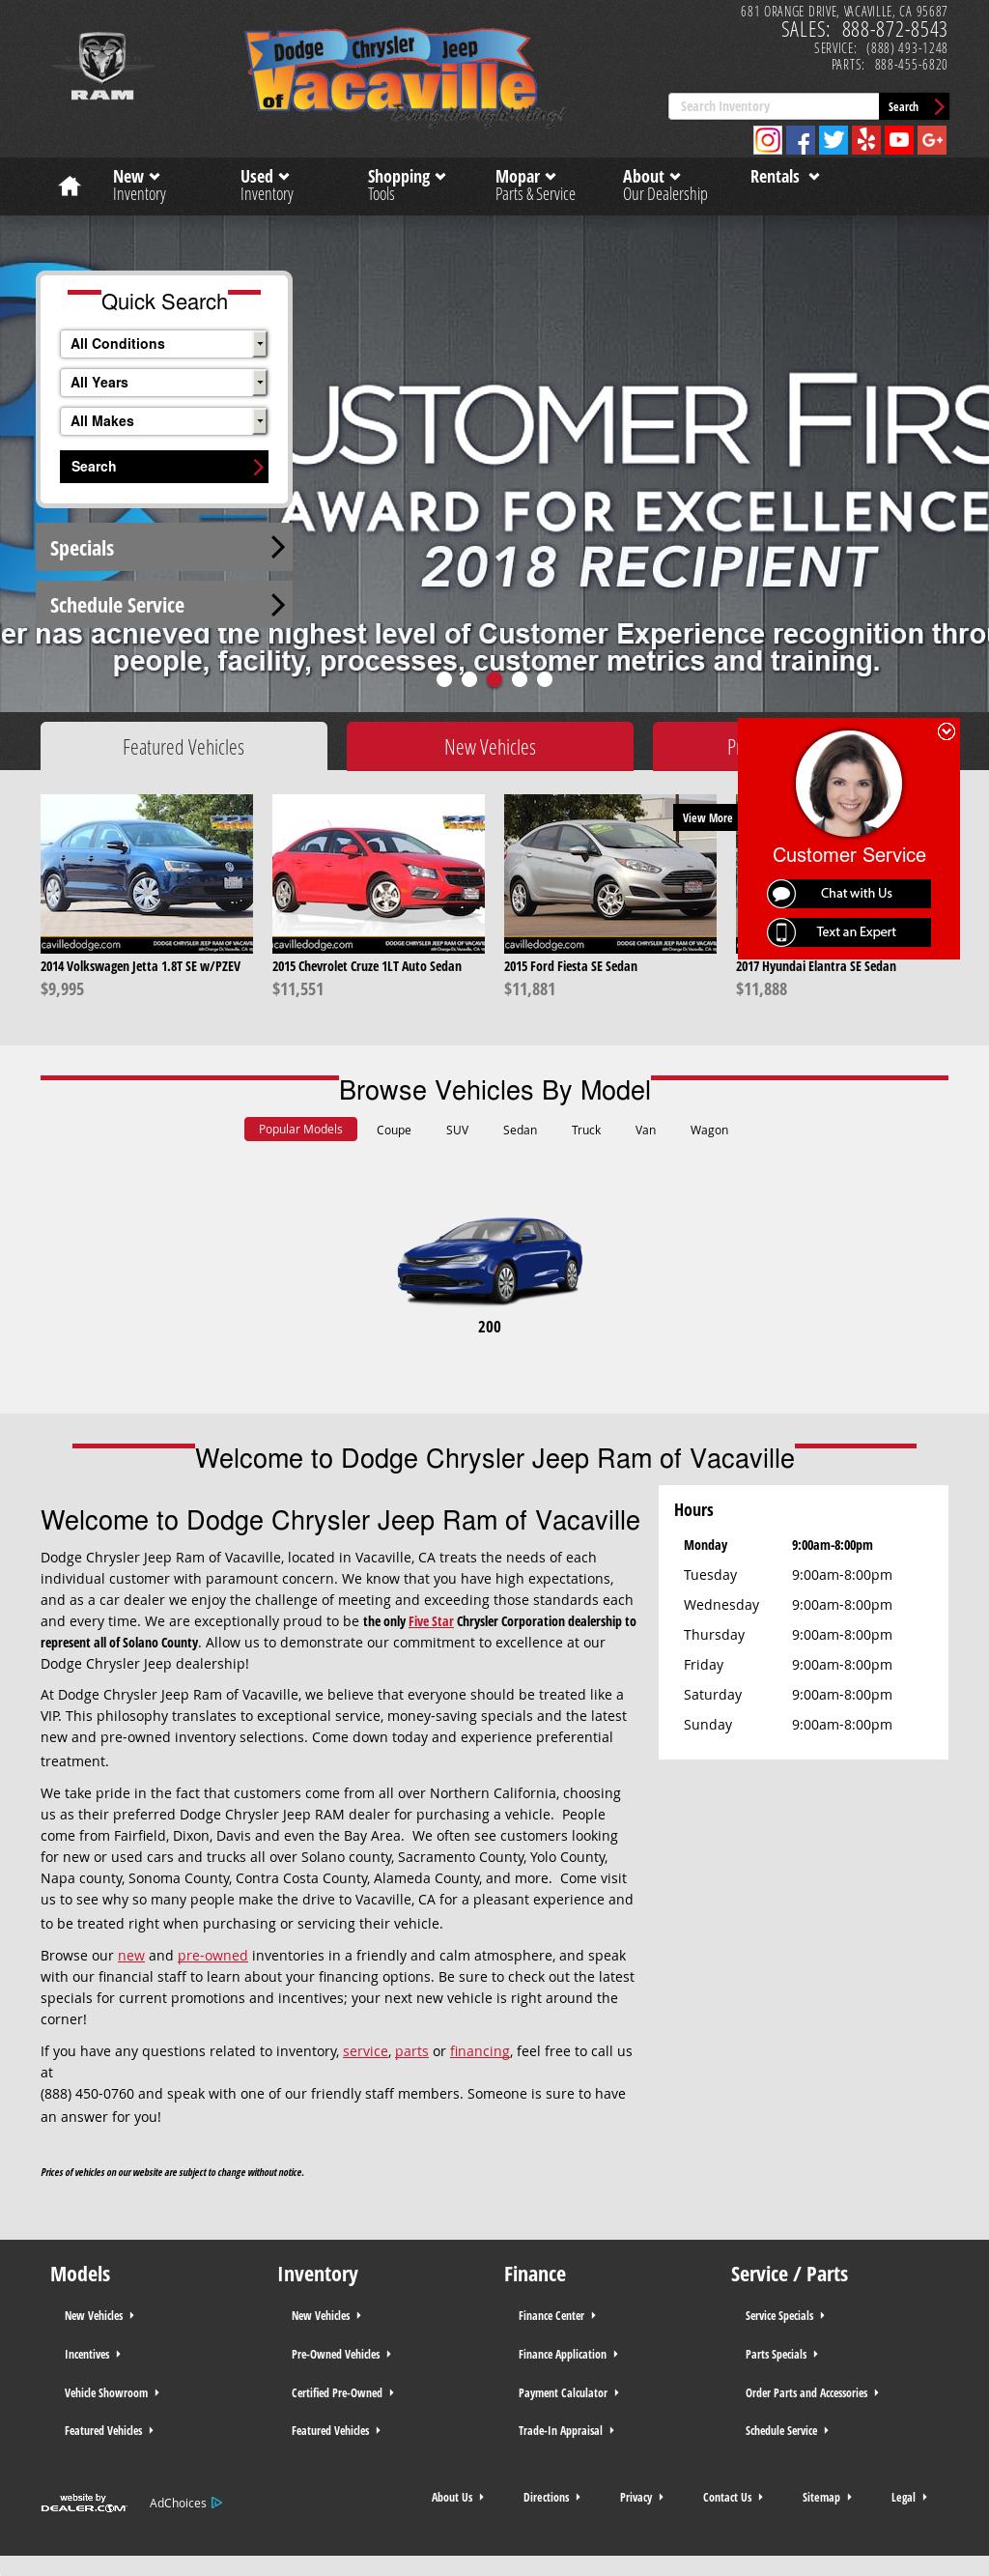 Dodge Chrysler Jeep Of Vacaville Website History